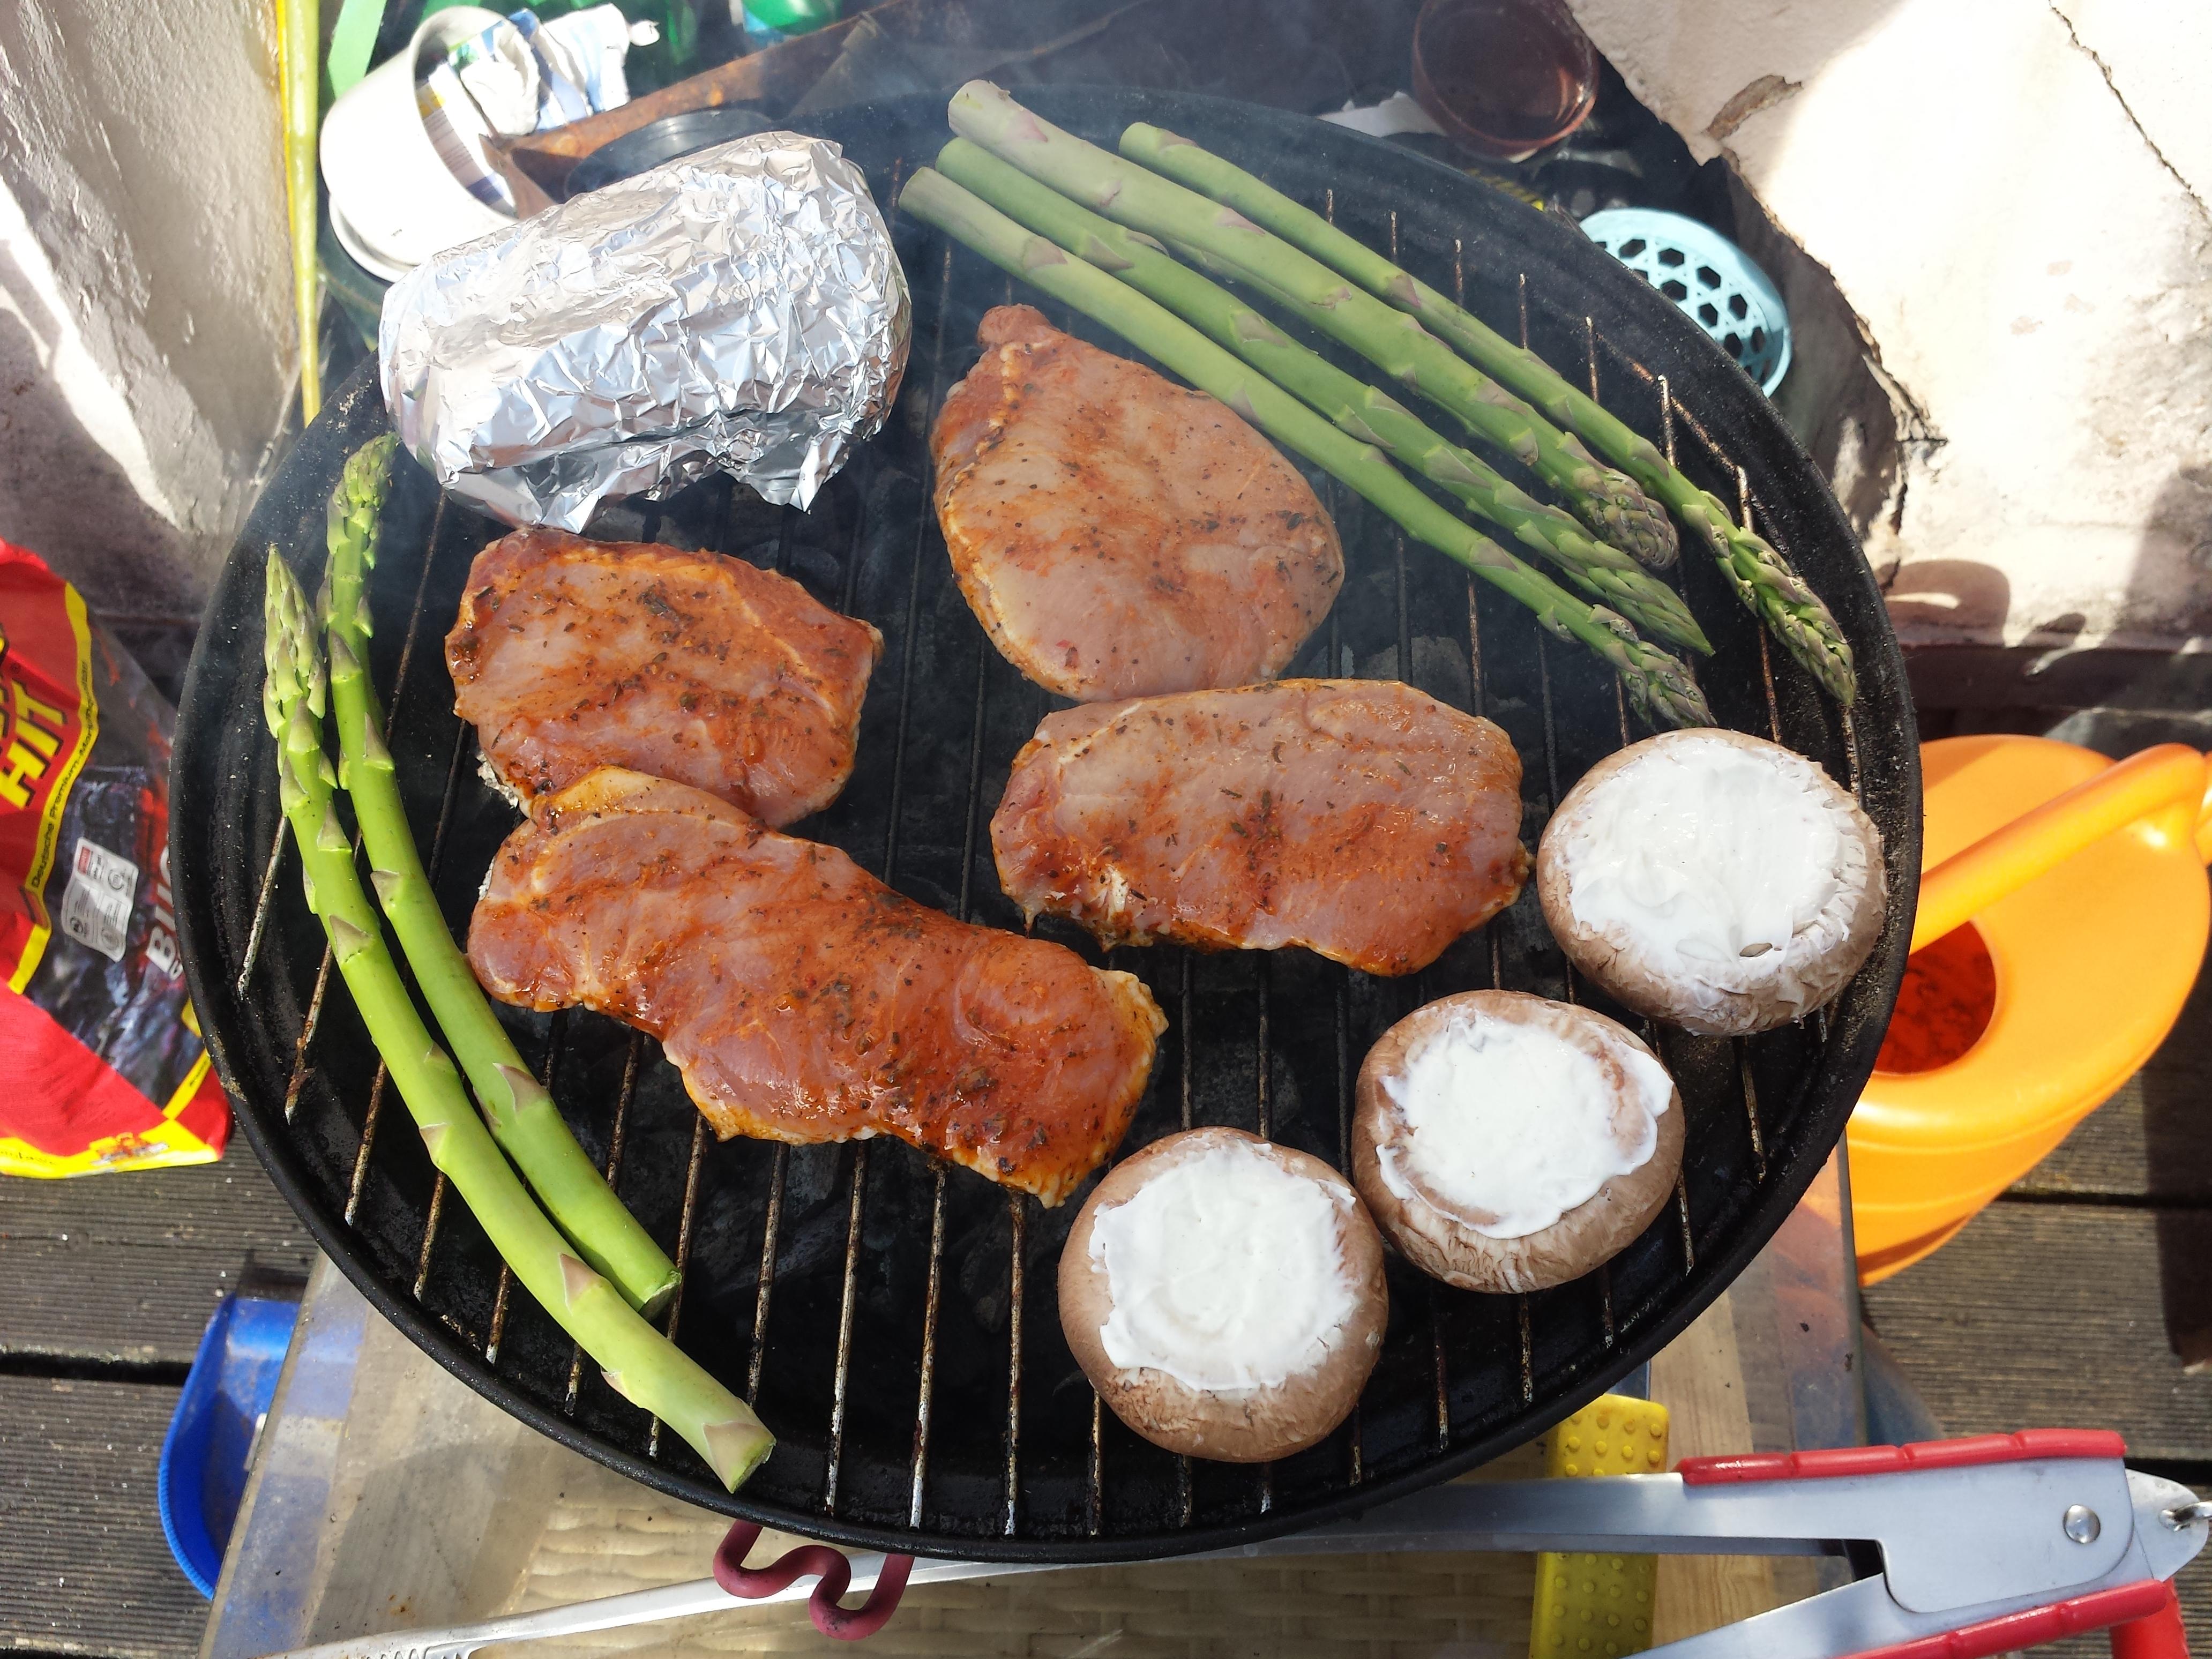 https://foodloader.net/Timber_2014-06-14_Grillgut.jpg